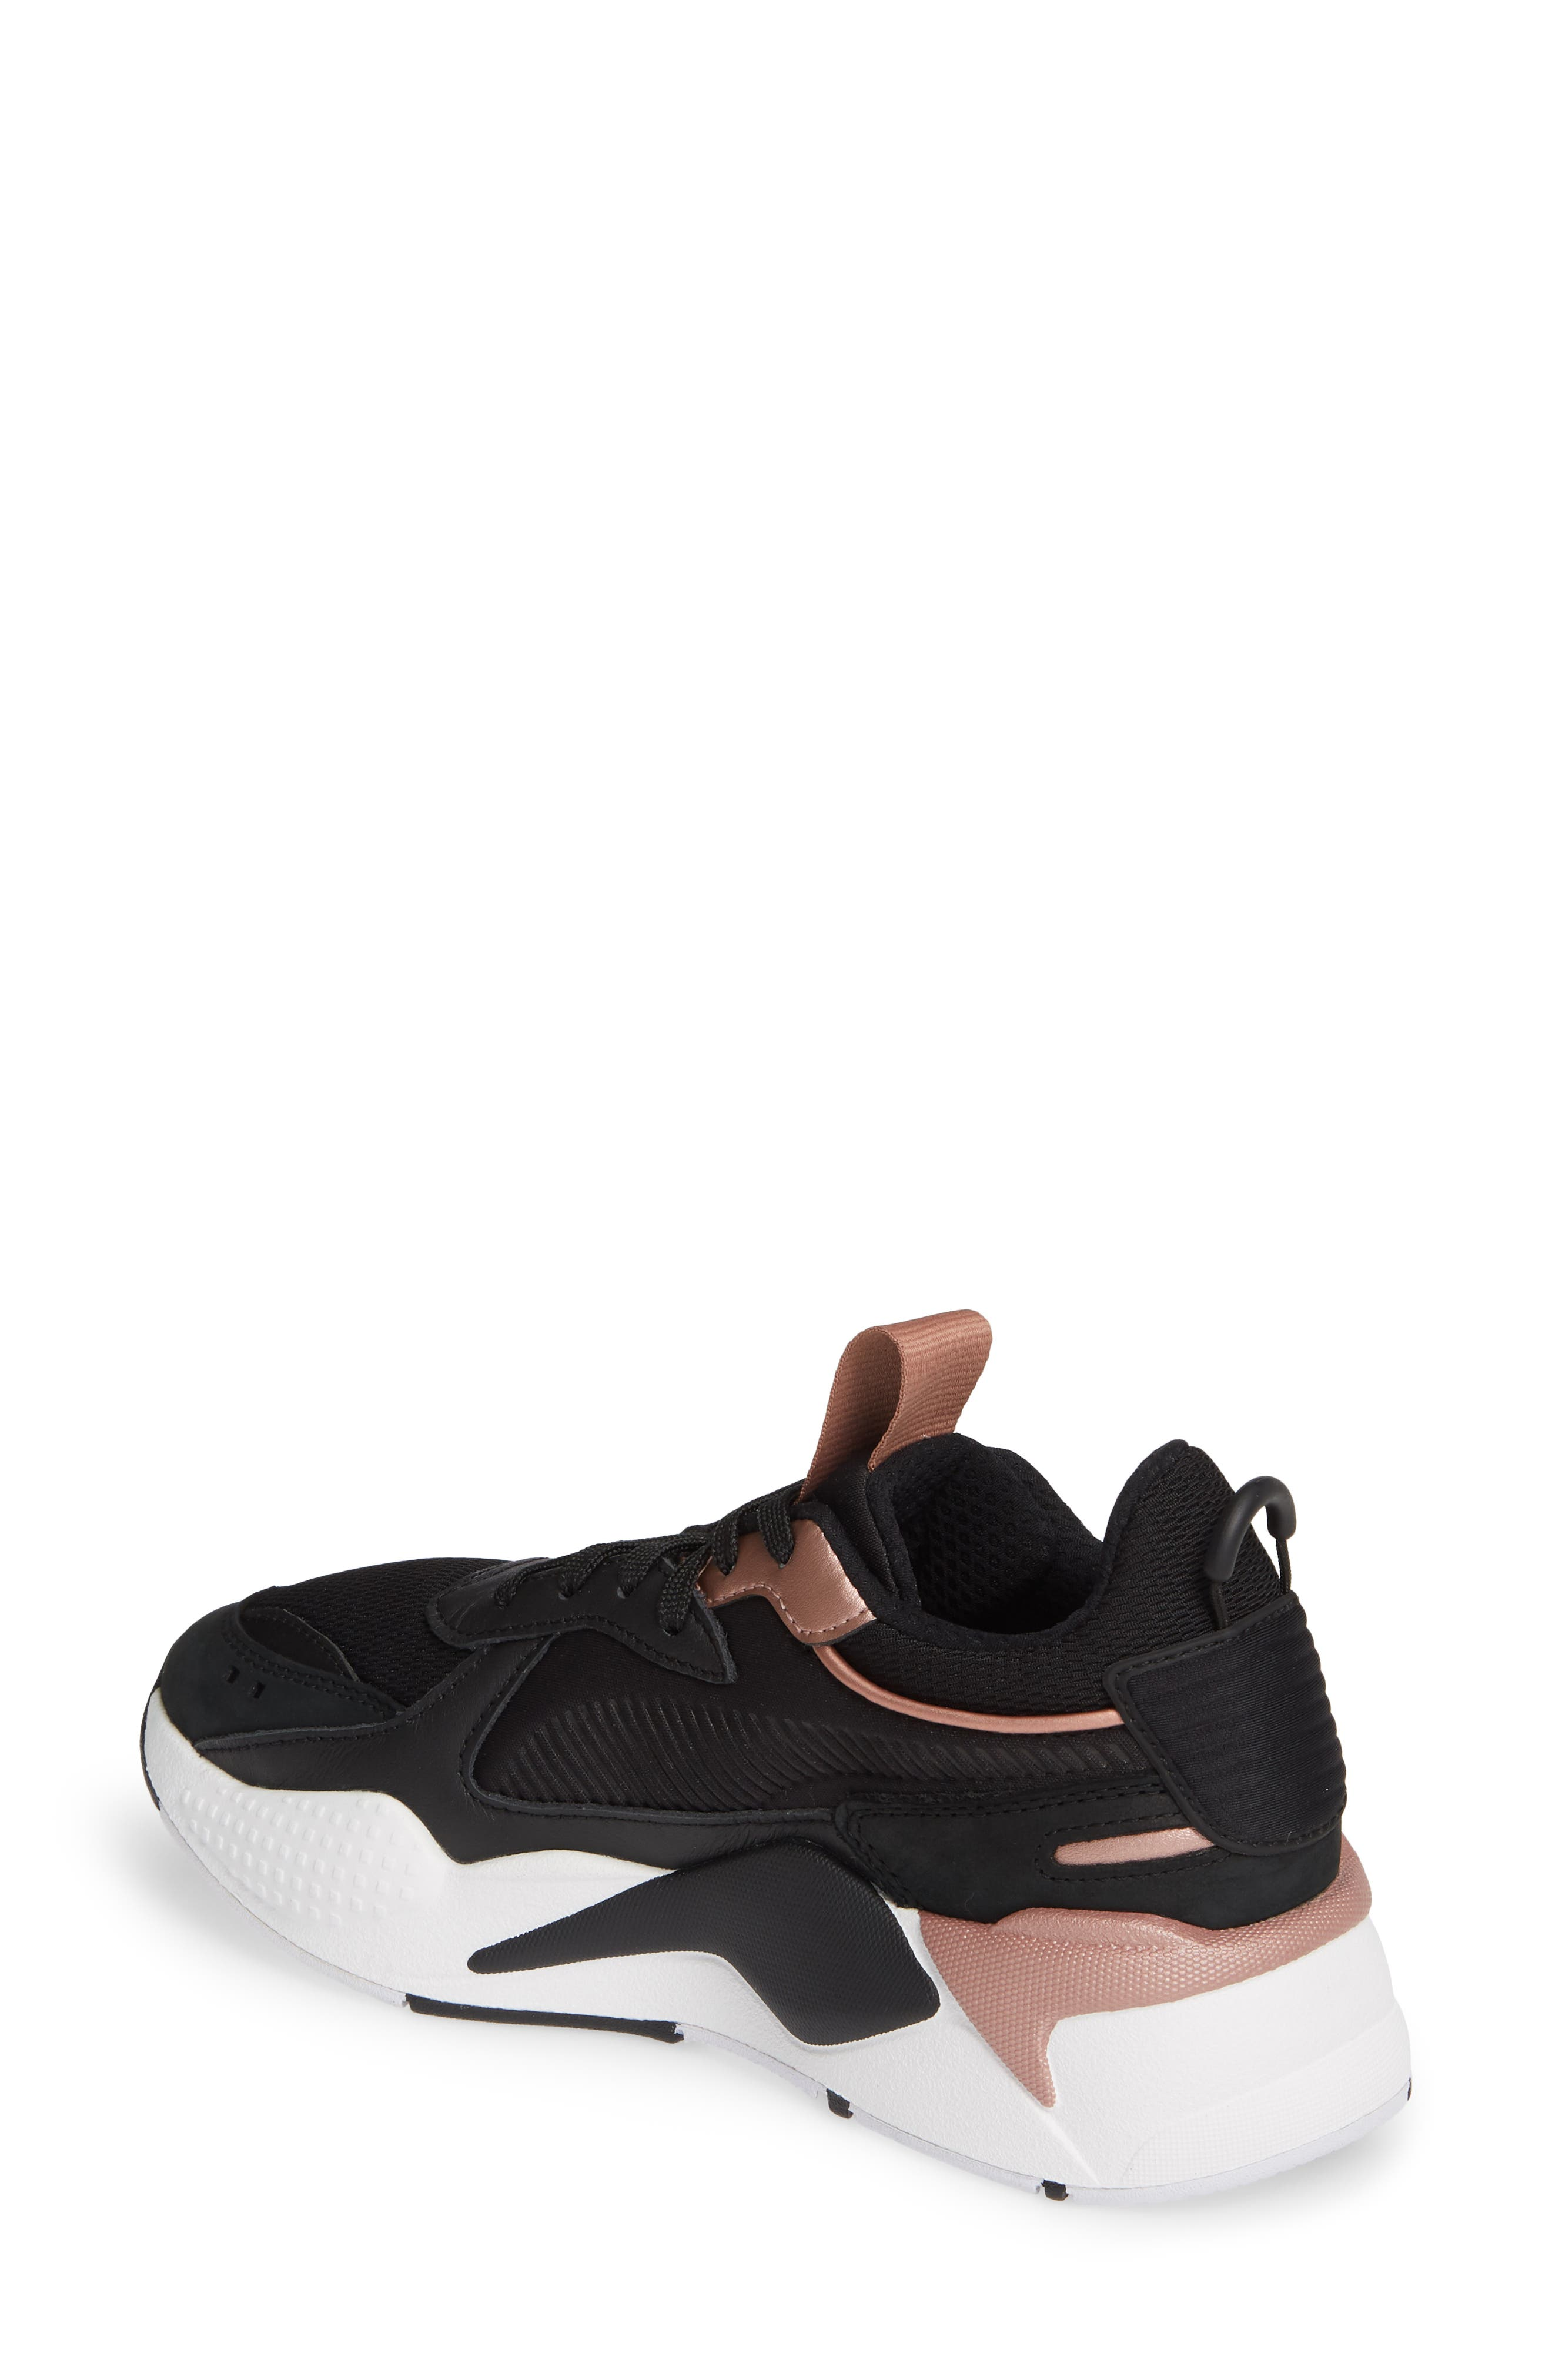 PUMA, RS-X Trophy Sneaker, Alternate thumbnail 2, color, BLACK/ ROSE GOLD